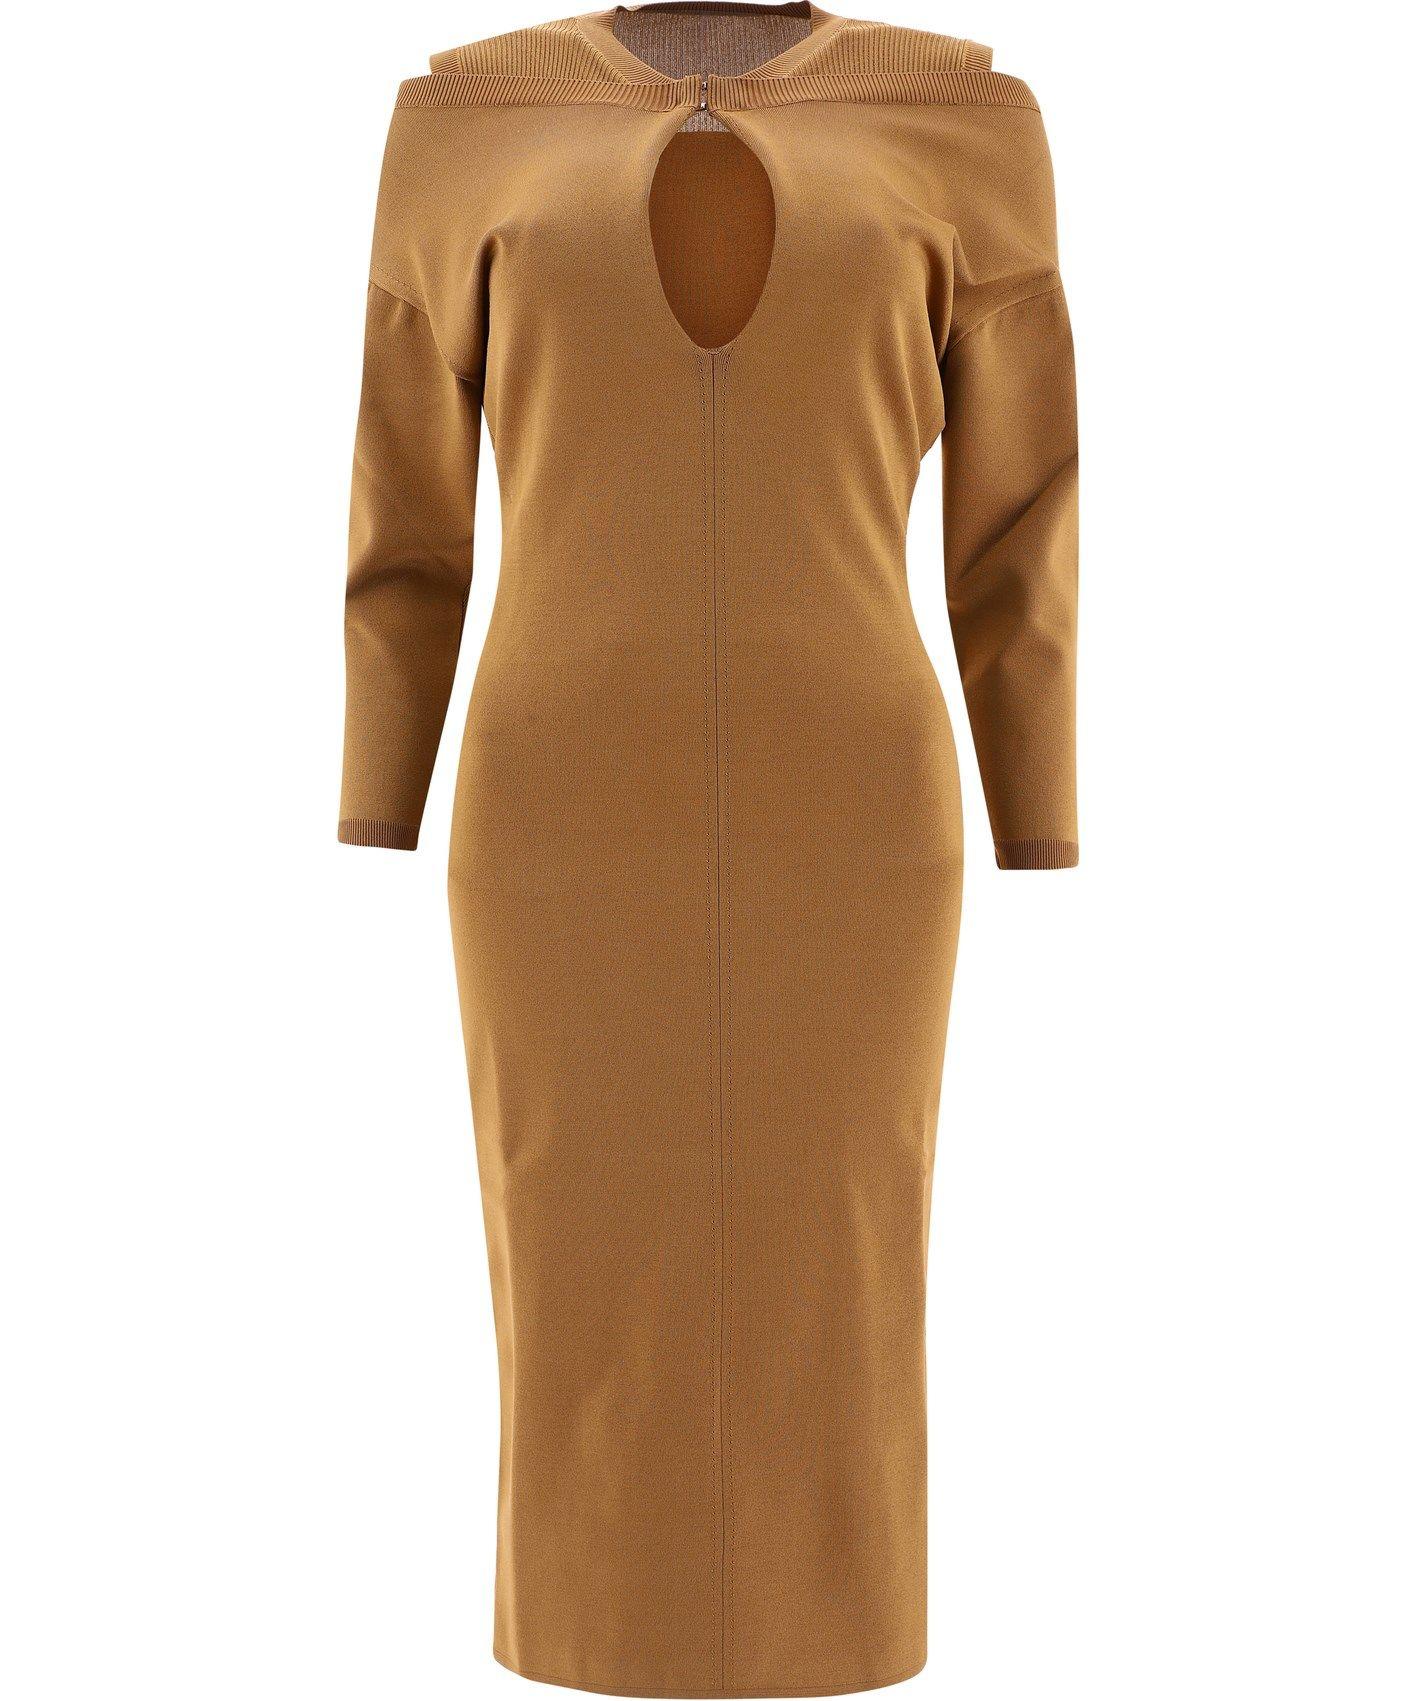 Burberry Dresses BURBERRY WOMEN'S BEIGE DRESS